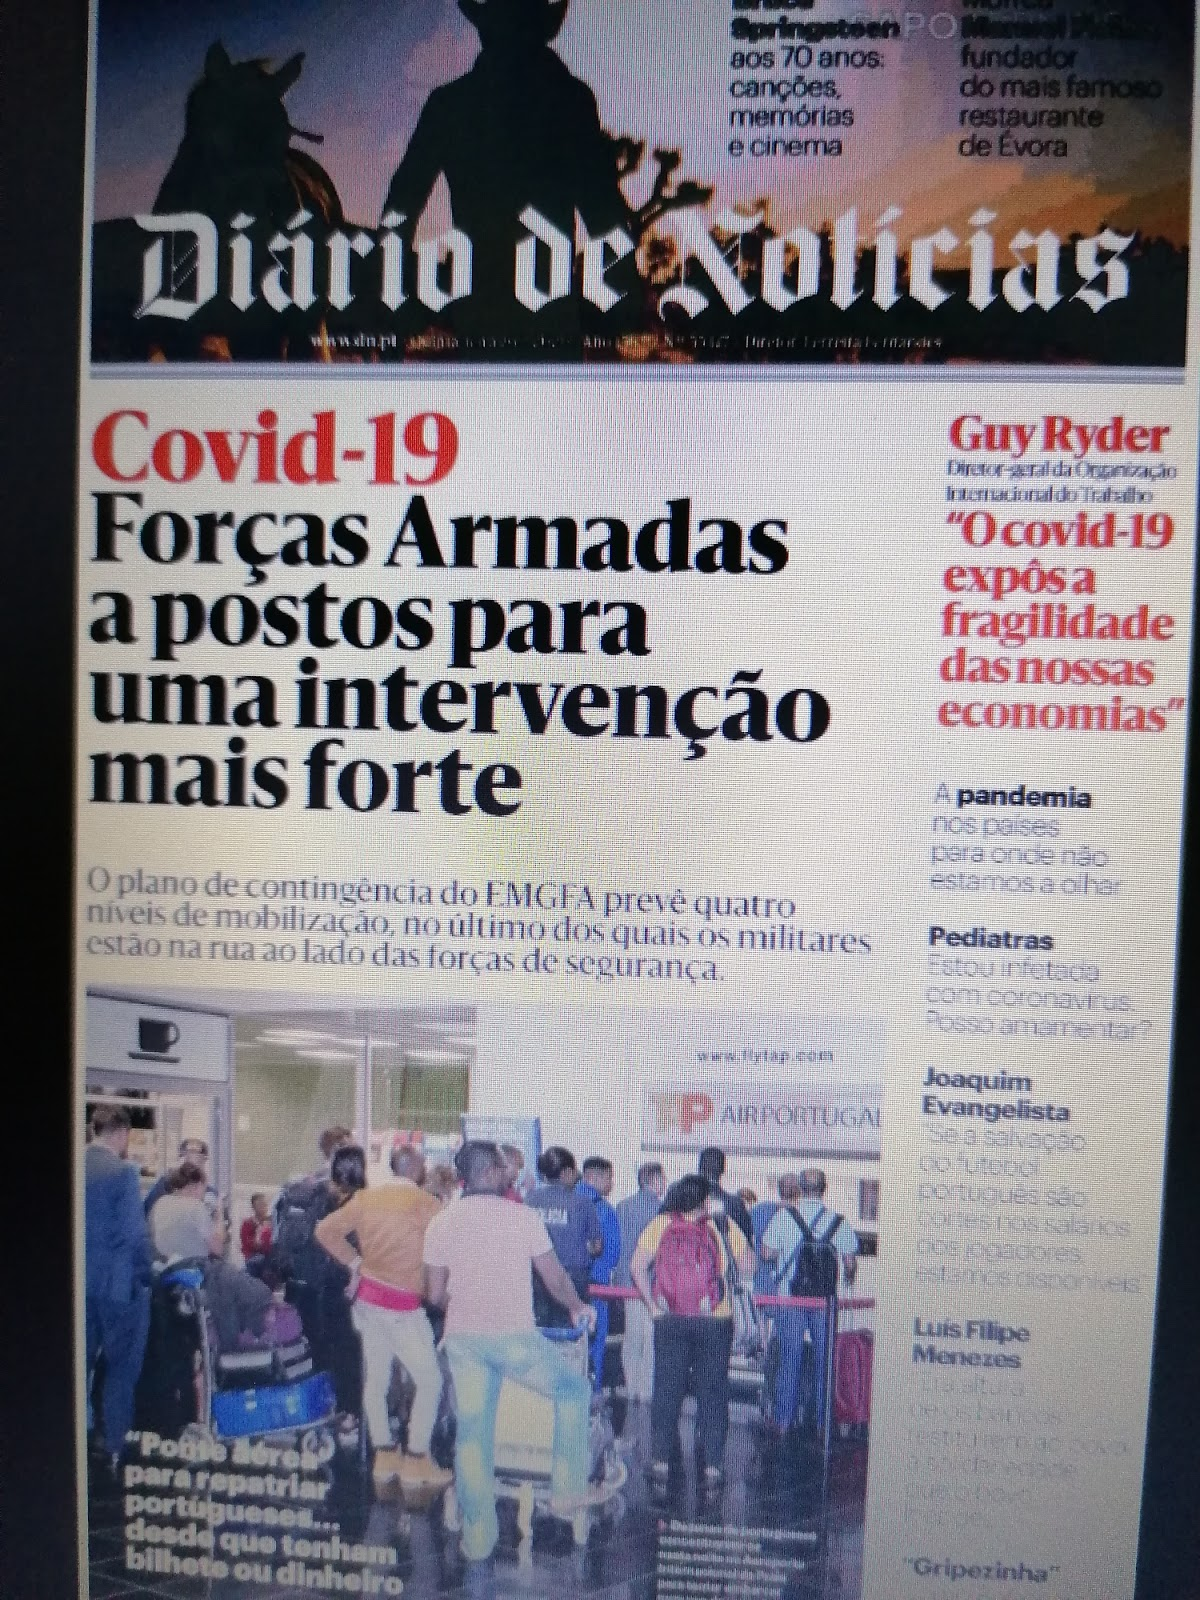 Jornalismo ou alarmismo?